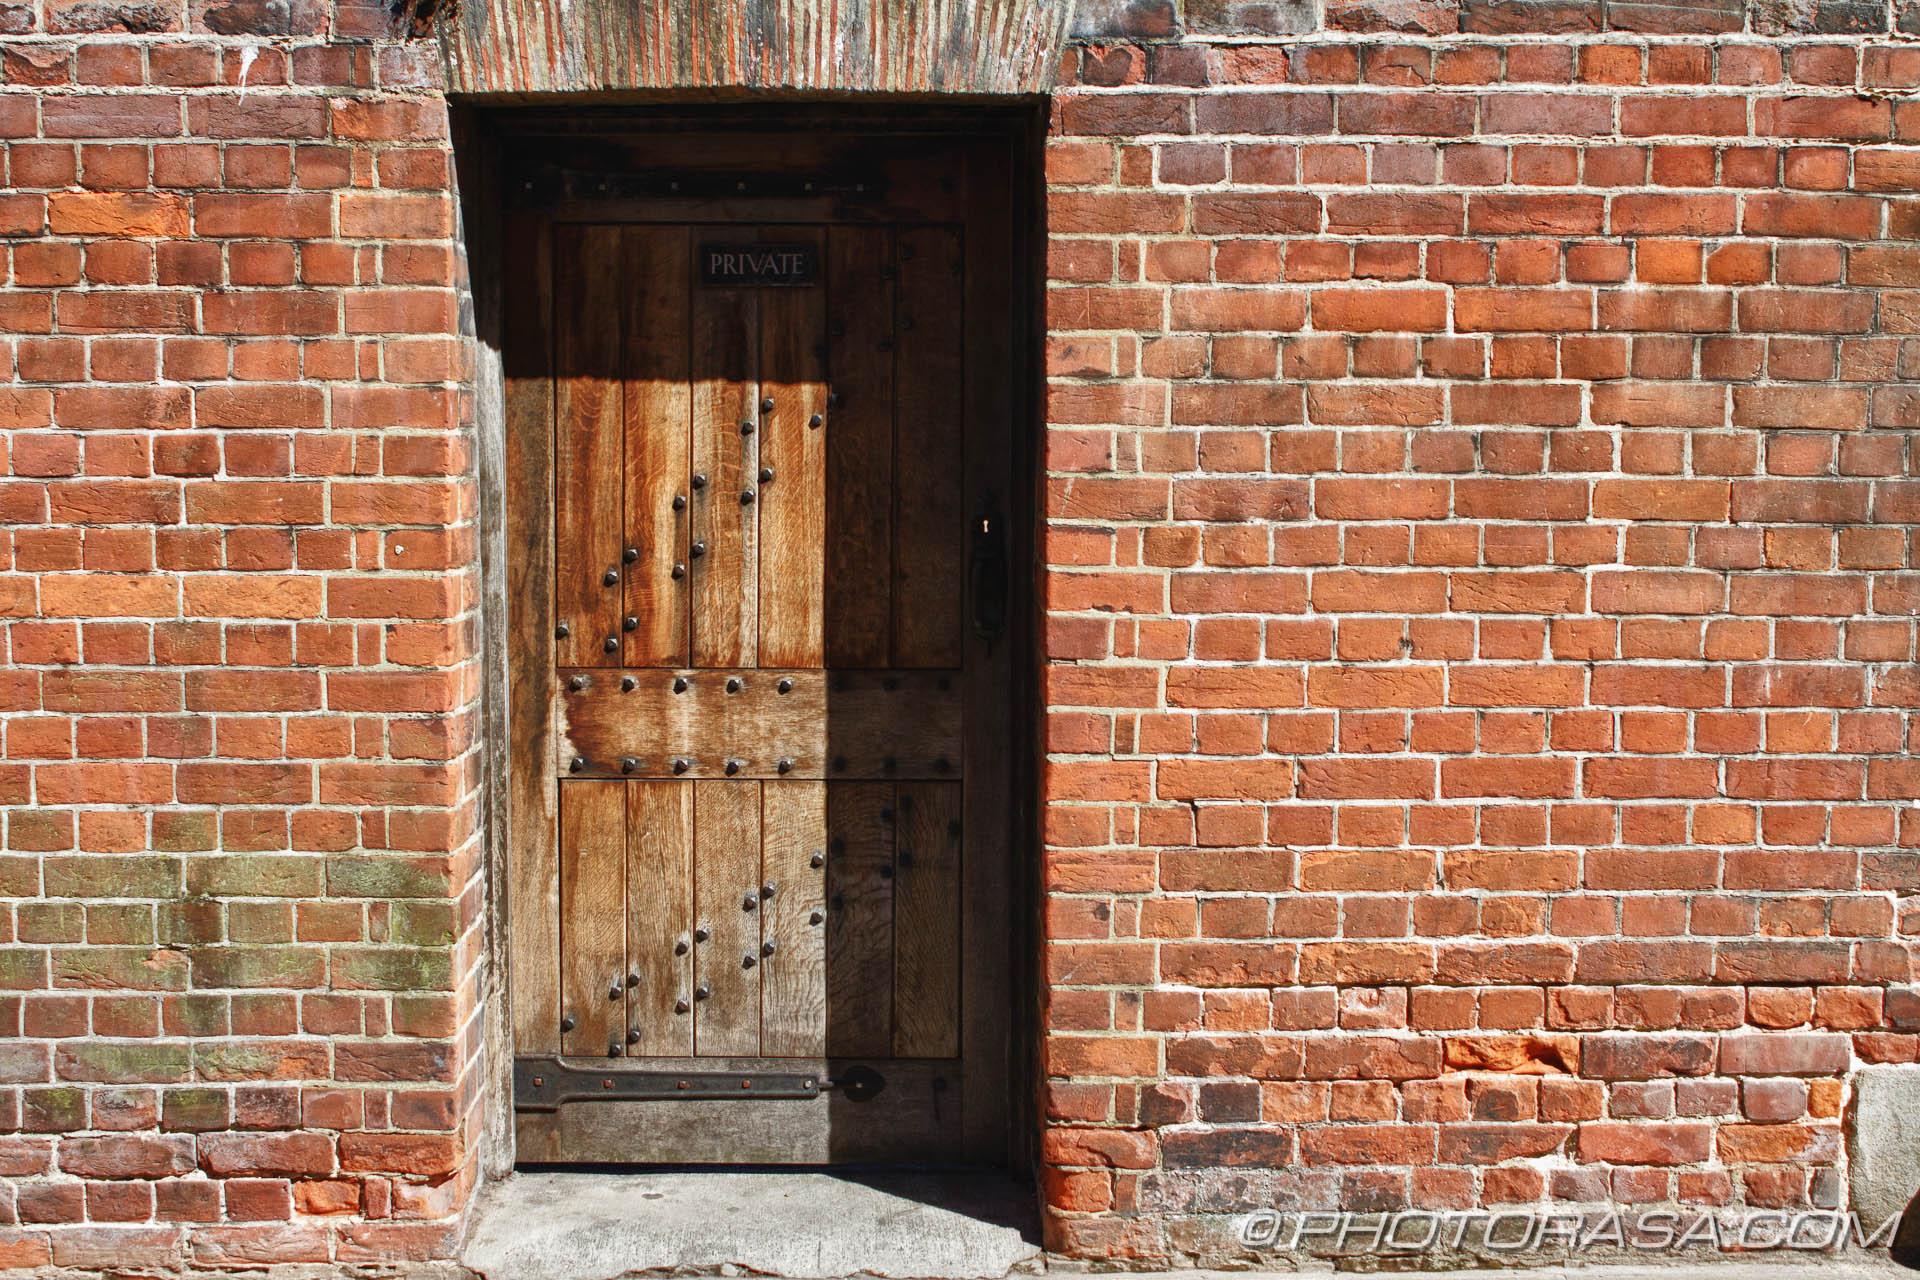 http://photorasa.com/canterbury-trip/old-door-in-wall/